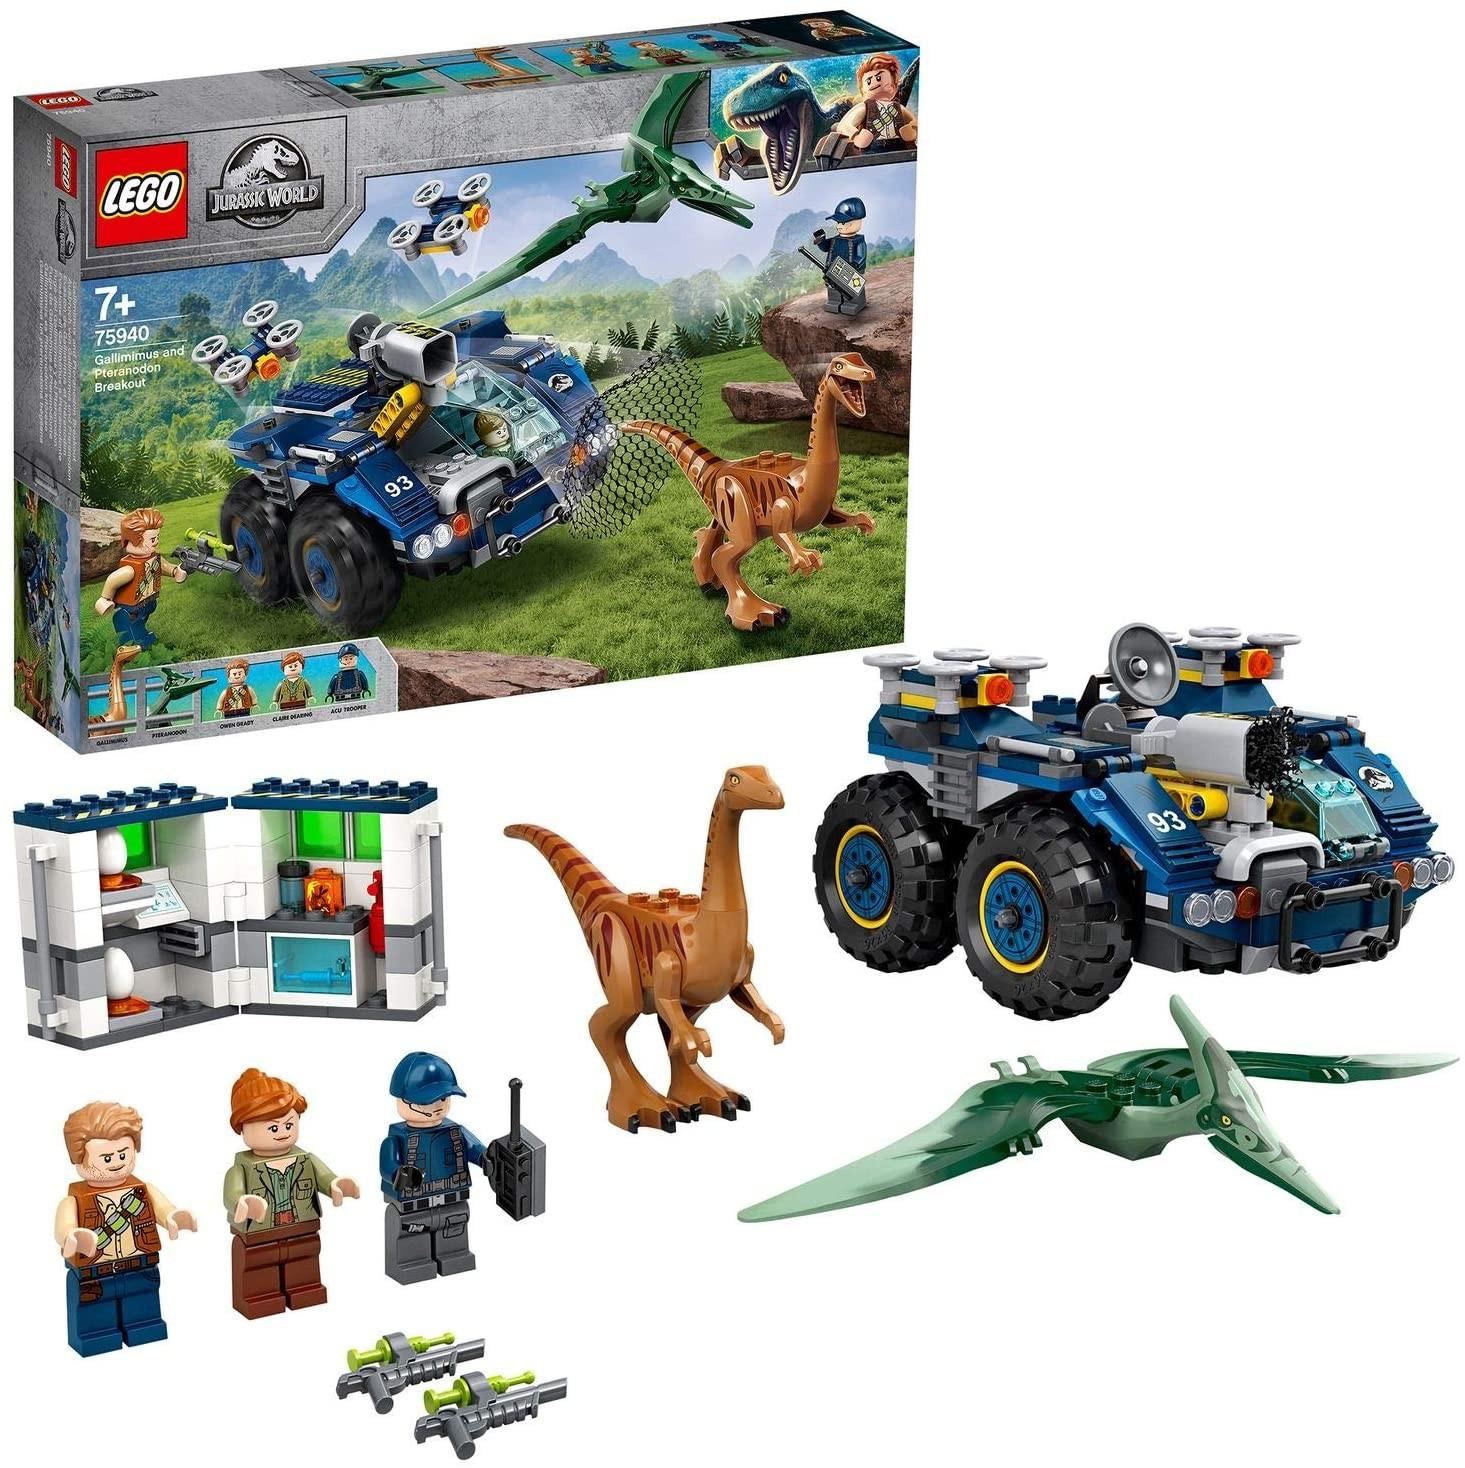 LEGO_Jurassic_World_Evadarea_lui_Galilmimus_si_Pteranodon_LEGO_75940_1